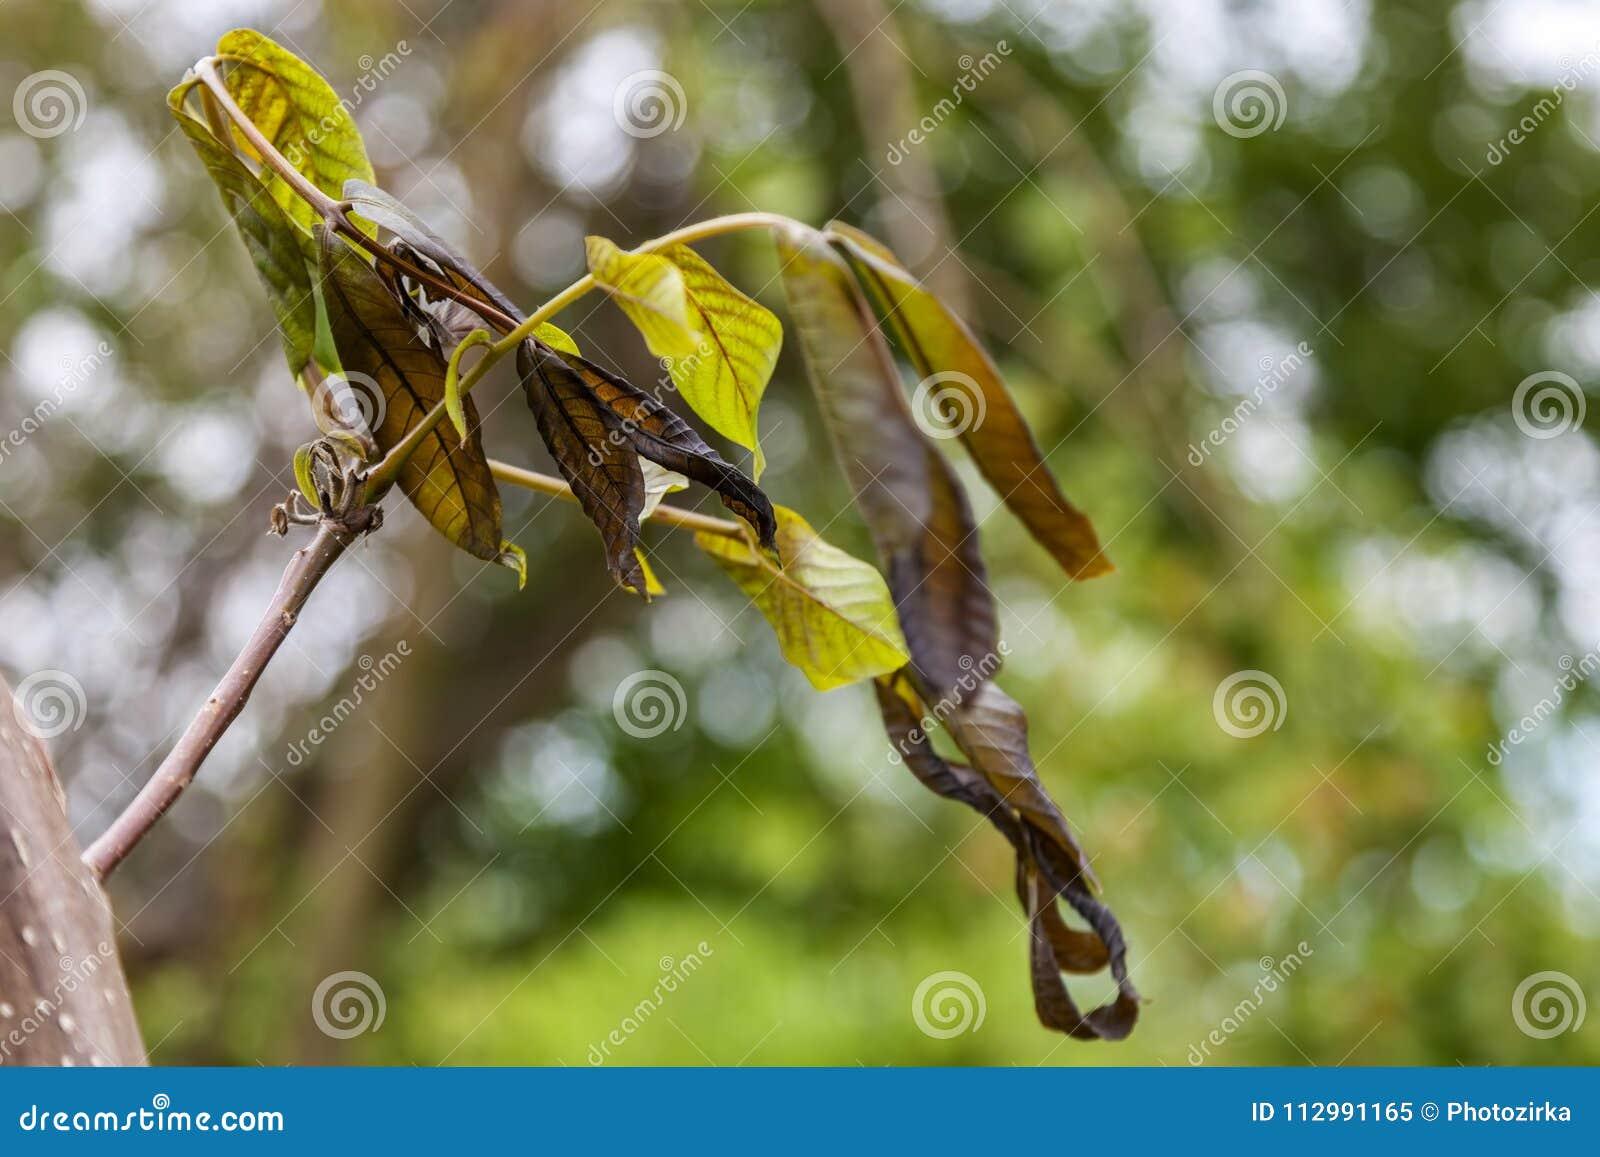 Walnut plant is damaged by frost